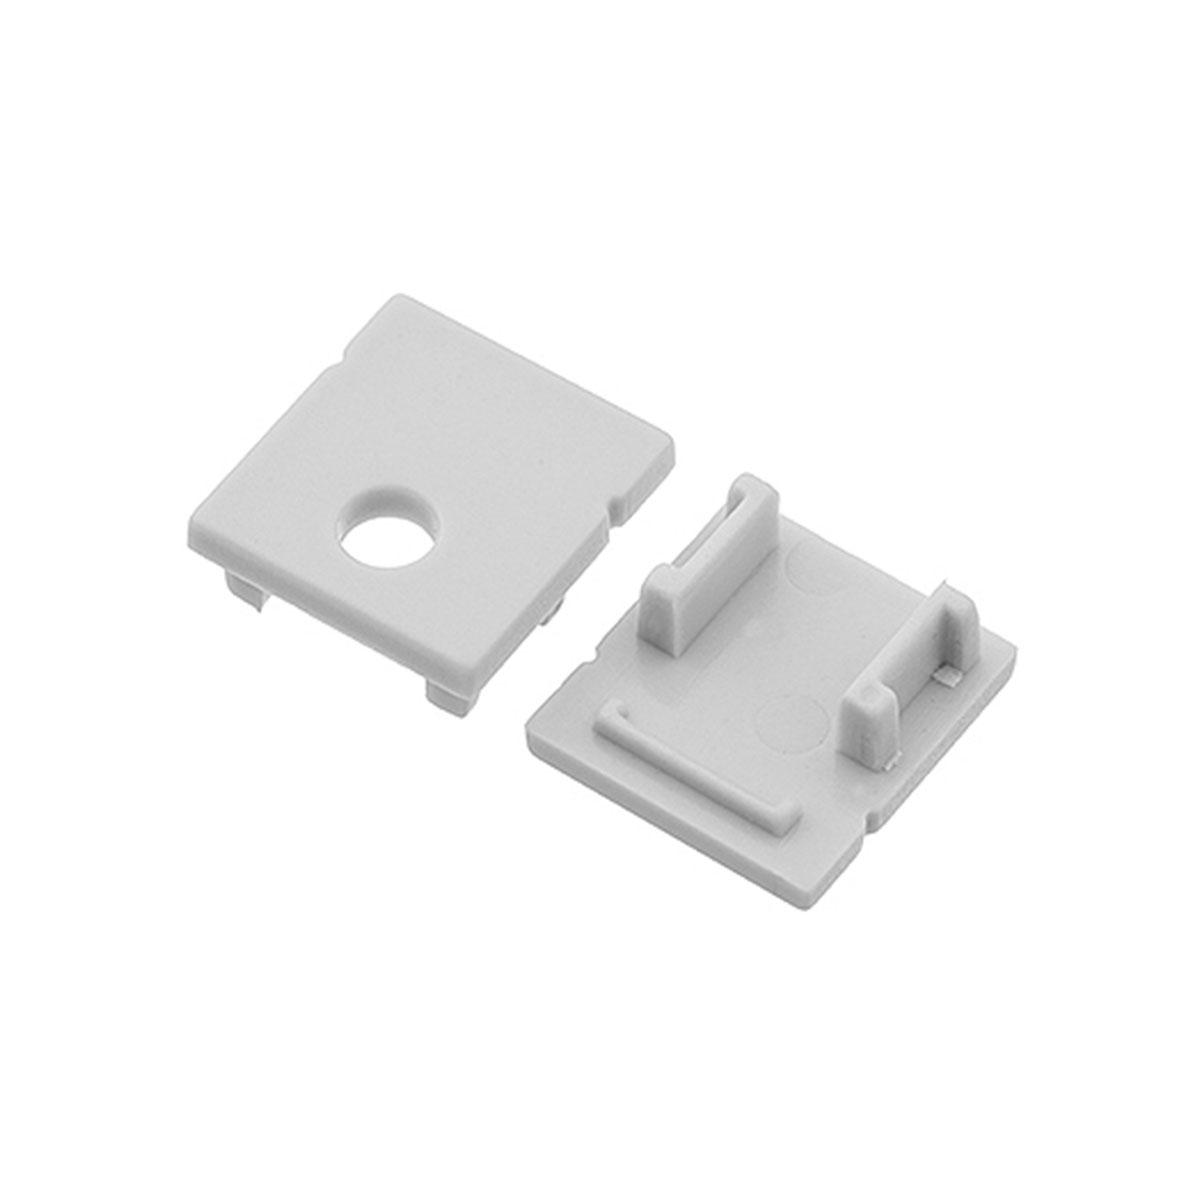 1 Paar Endkappen für Aufbau U-Profil 14 x 15mm (4294)